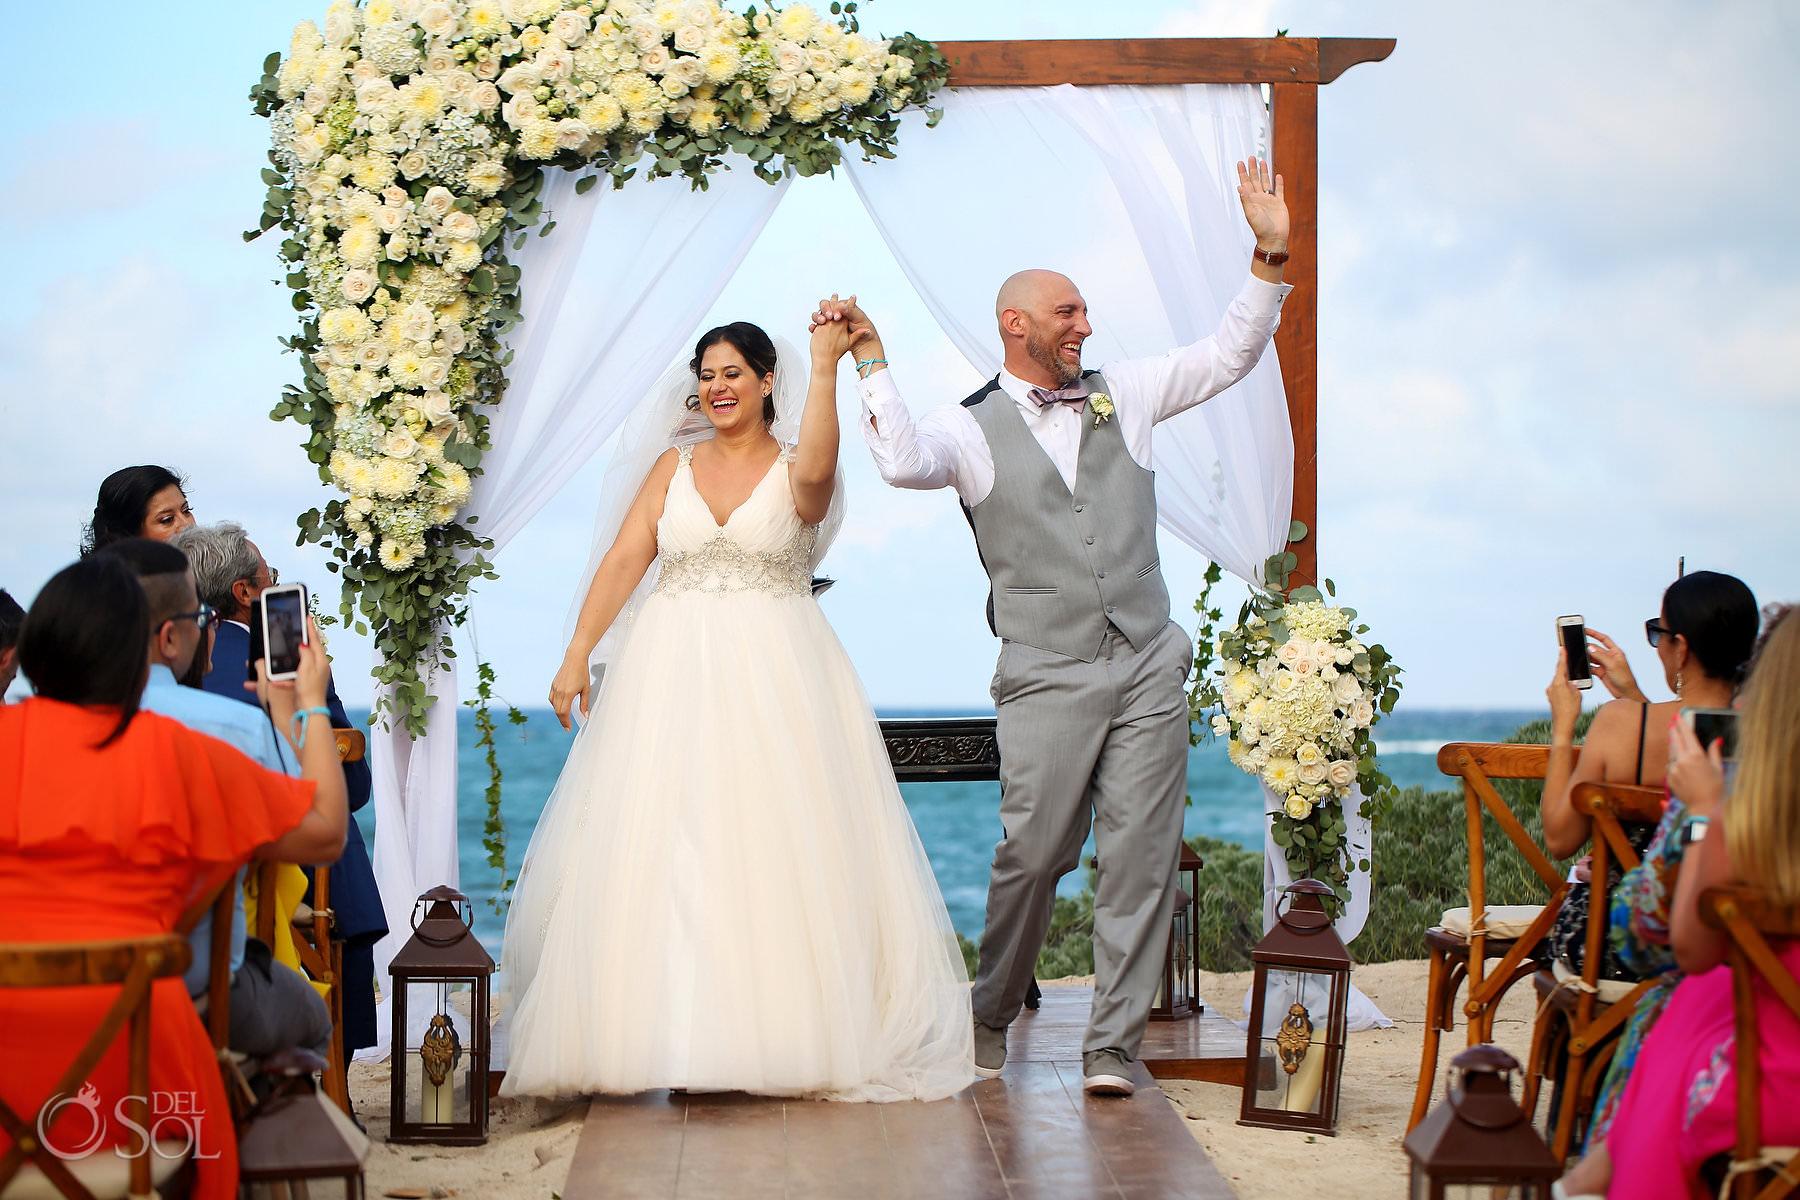 Best wedding locations Tulum mexico akumal bay beach and wellness resort